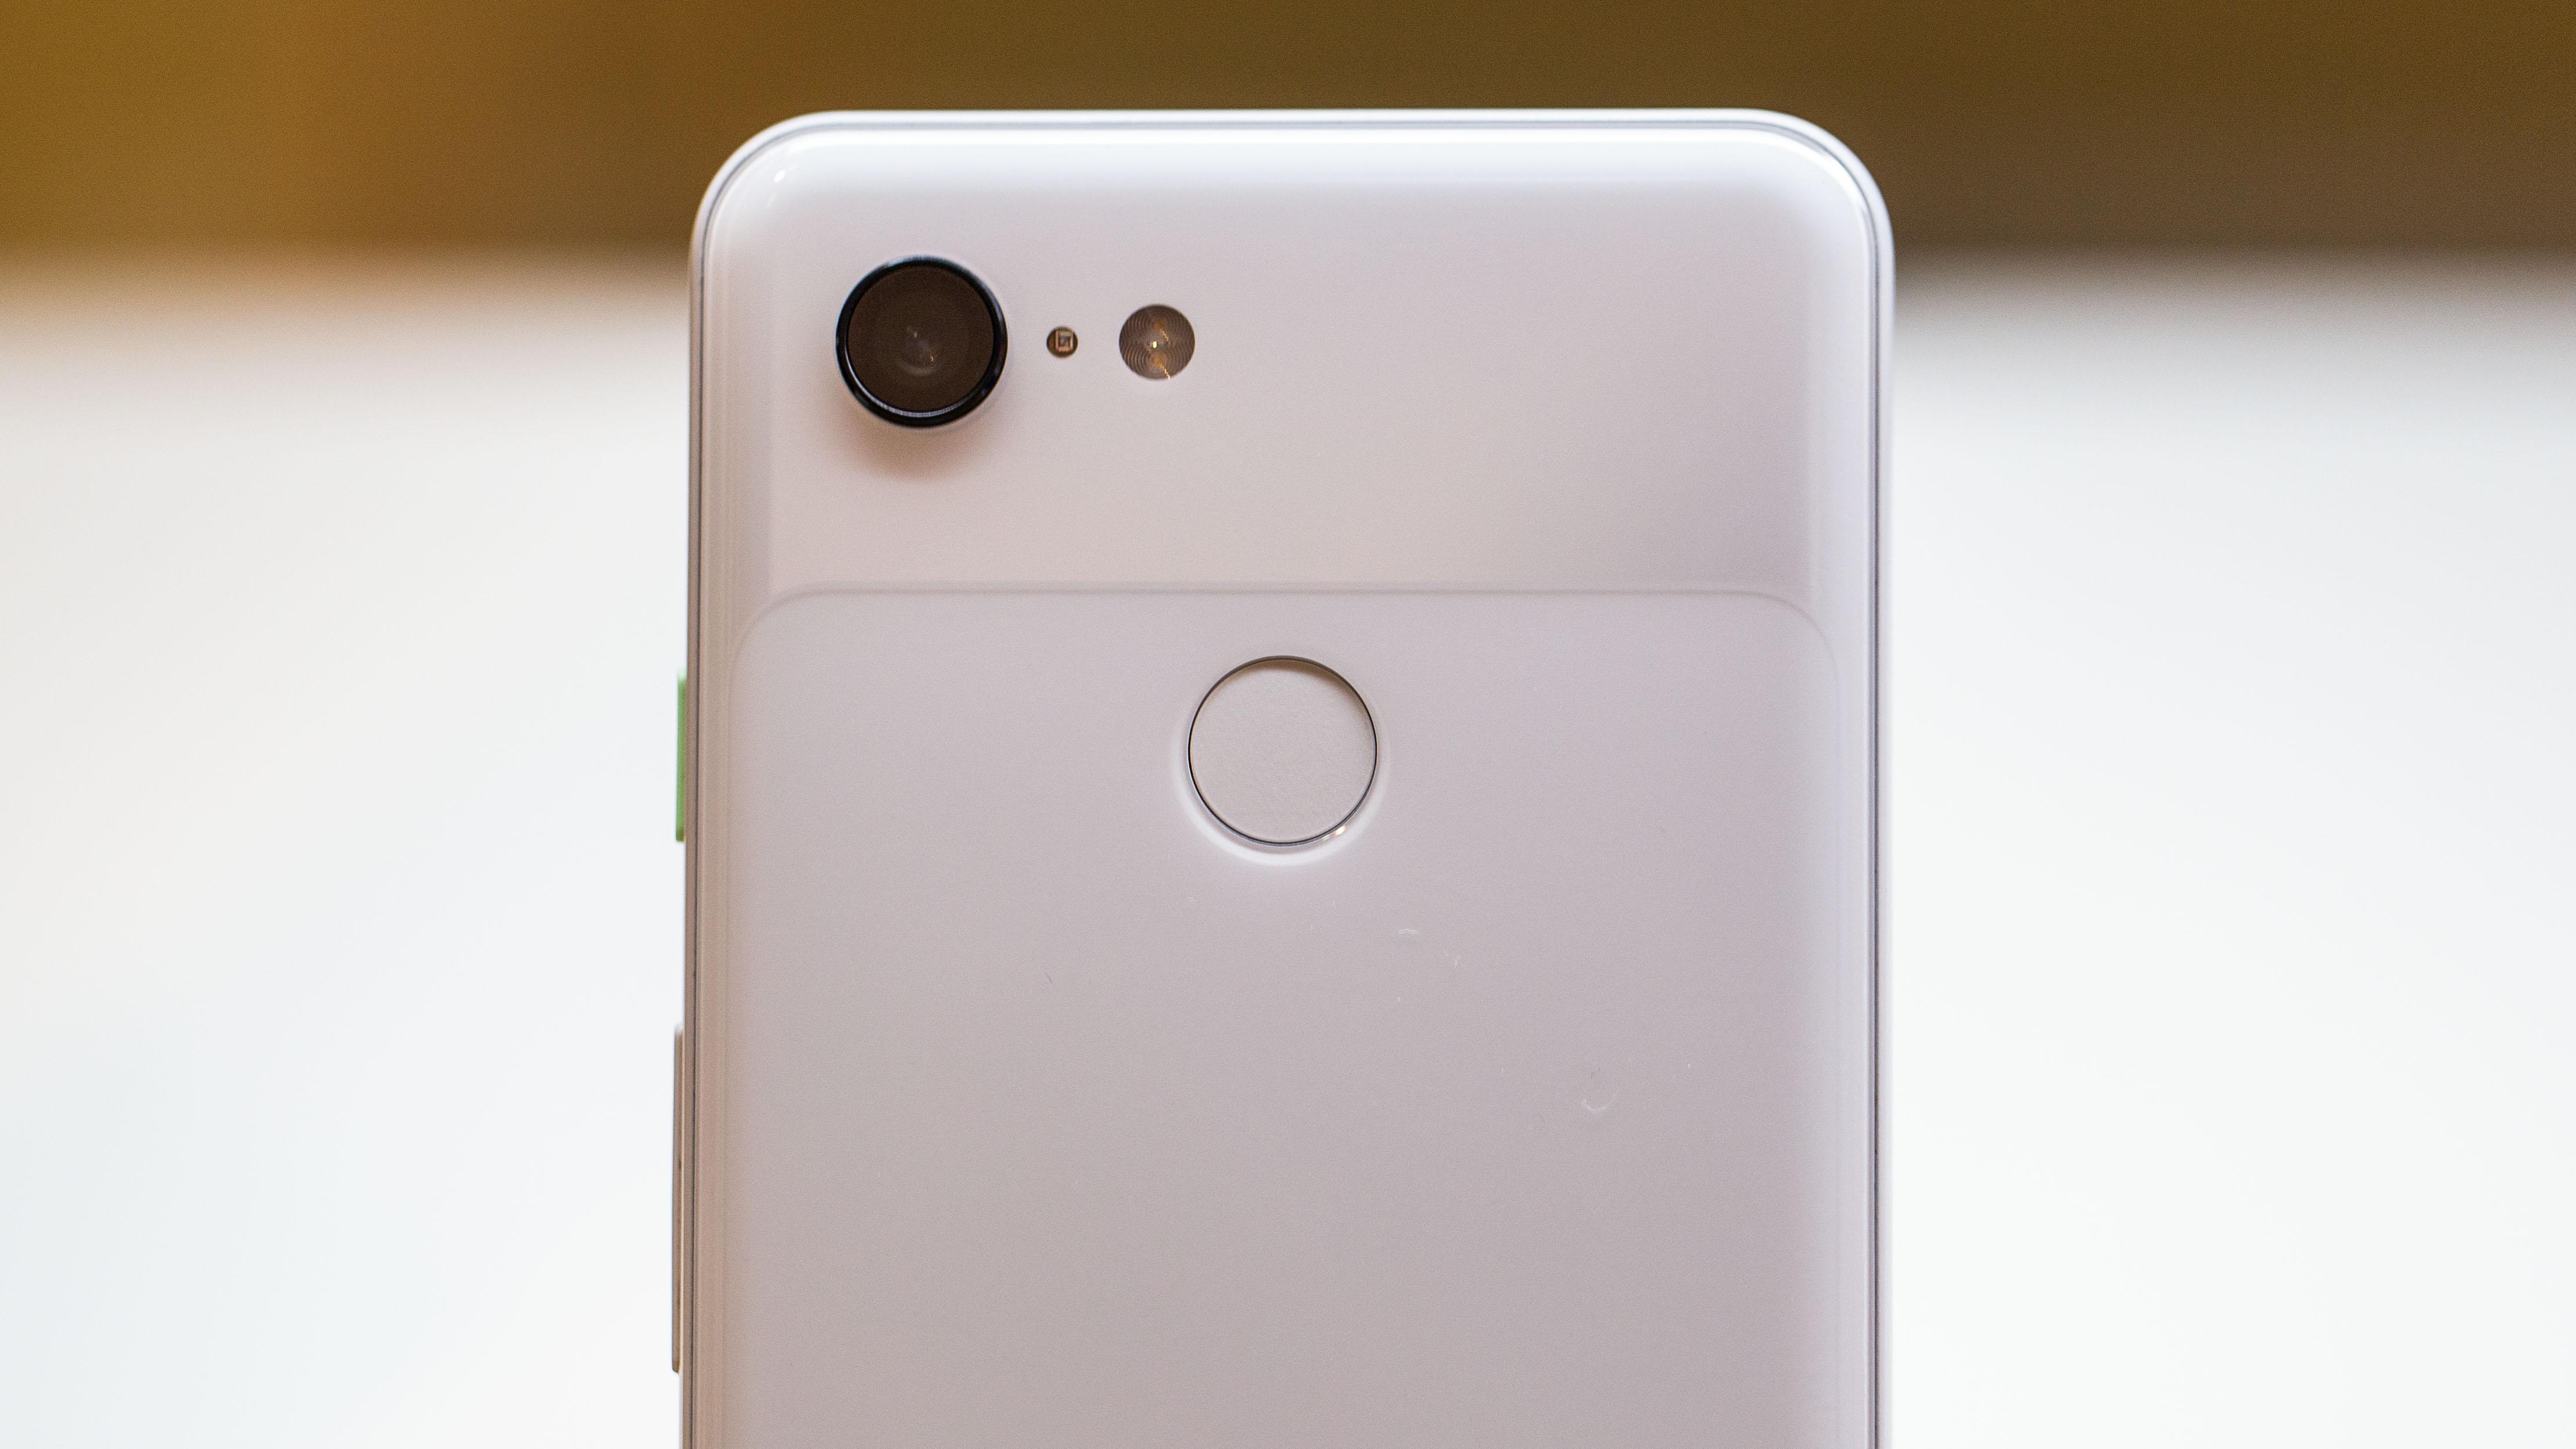 Google Pixel 3 Wallpaper Apk Mirror – Free Download Wallpaper